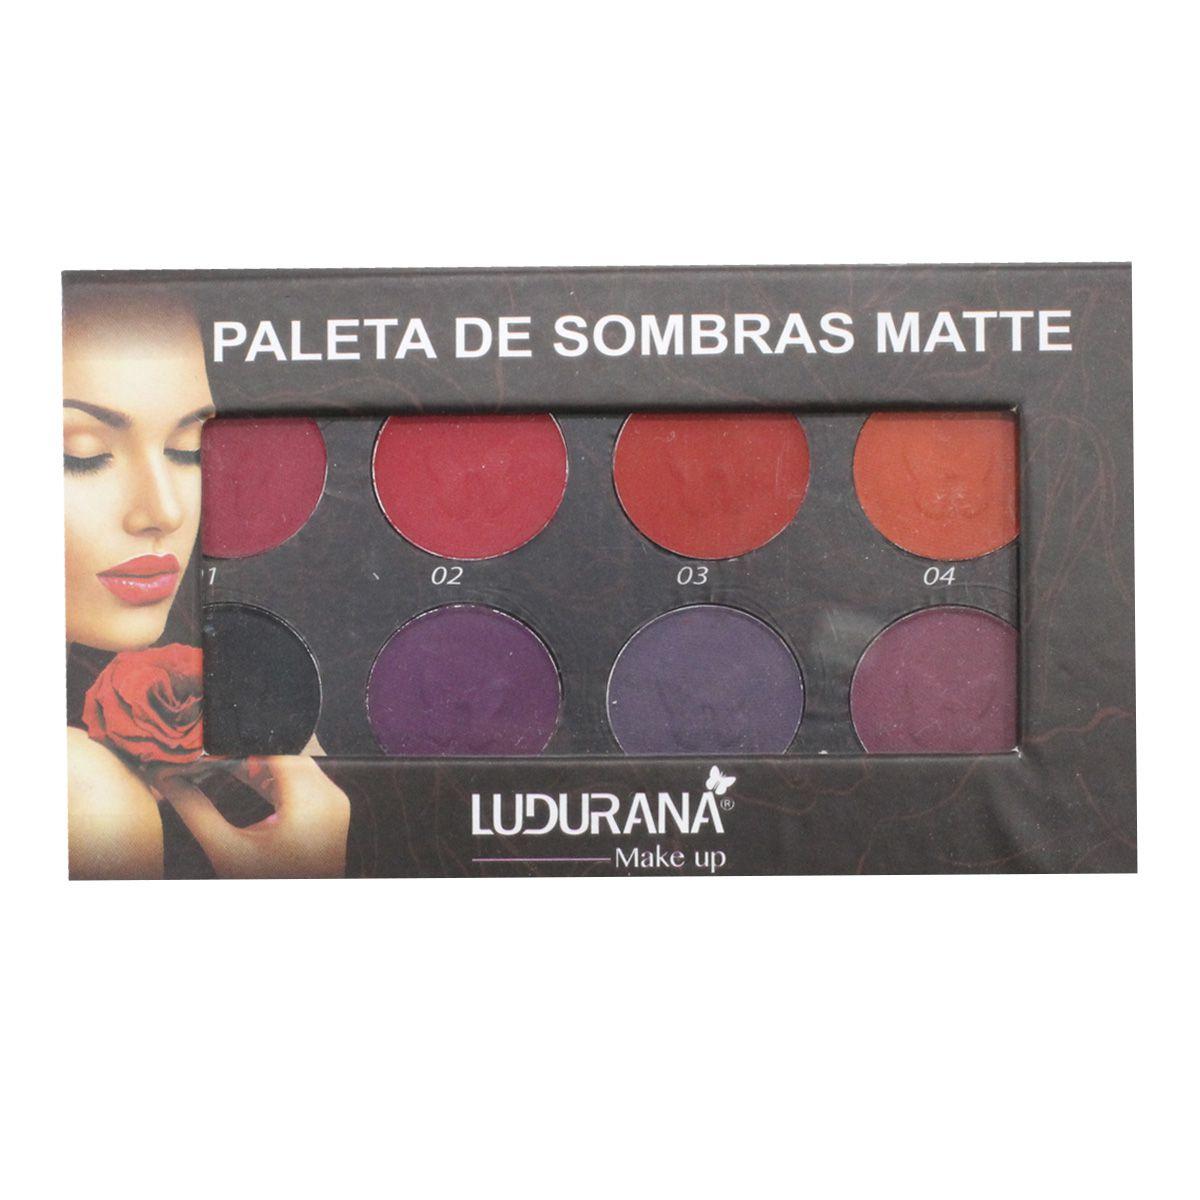 Paleta de Sombras Ludurana Matte 08 cores Original  7789